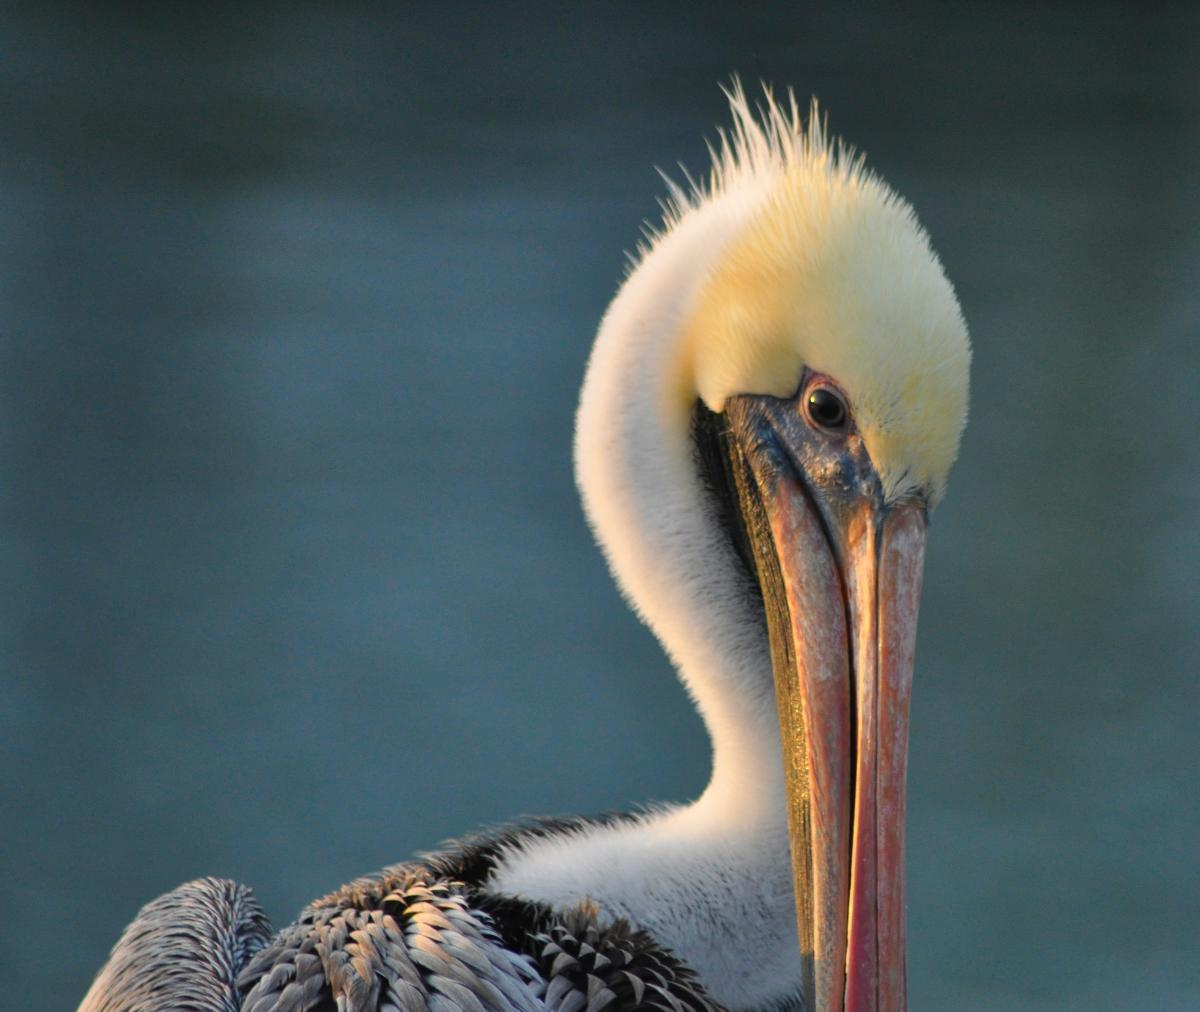 Galveston birding